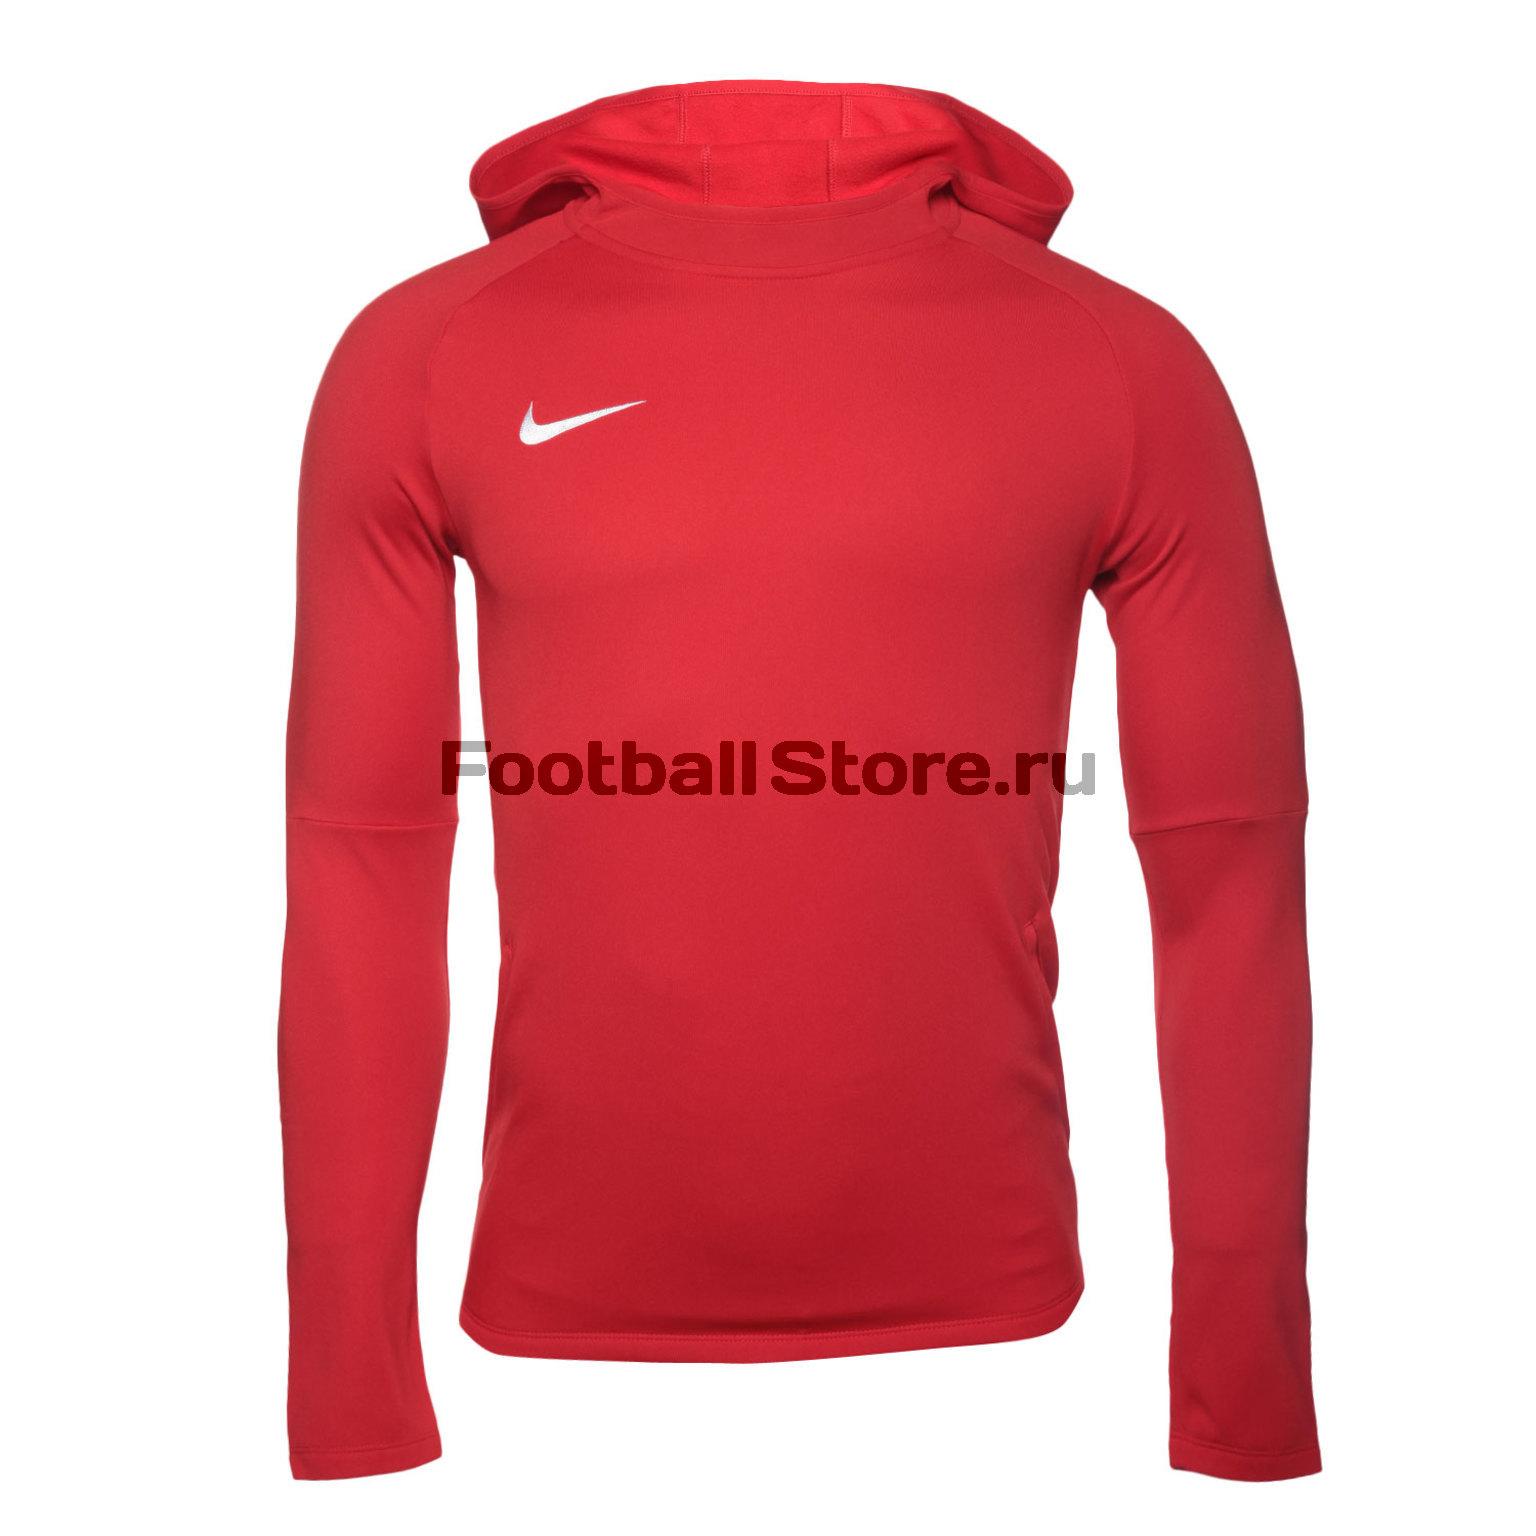 Толстовка Nike Dry Academy18 Hoodie PO AH9608-657 костюм спортивный nike dry academy 18 football tracksuit 893709 657 красн черн